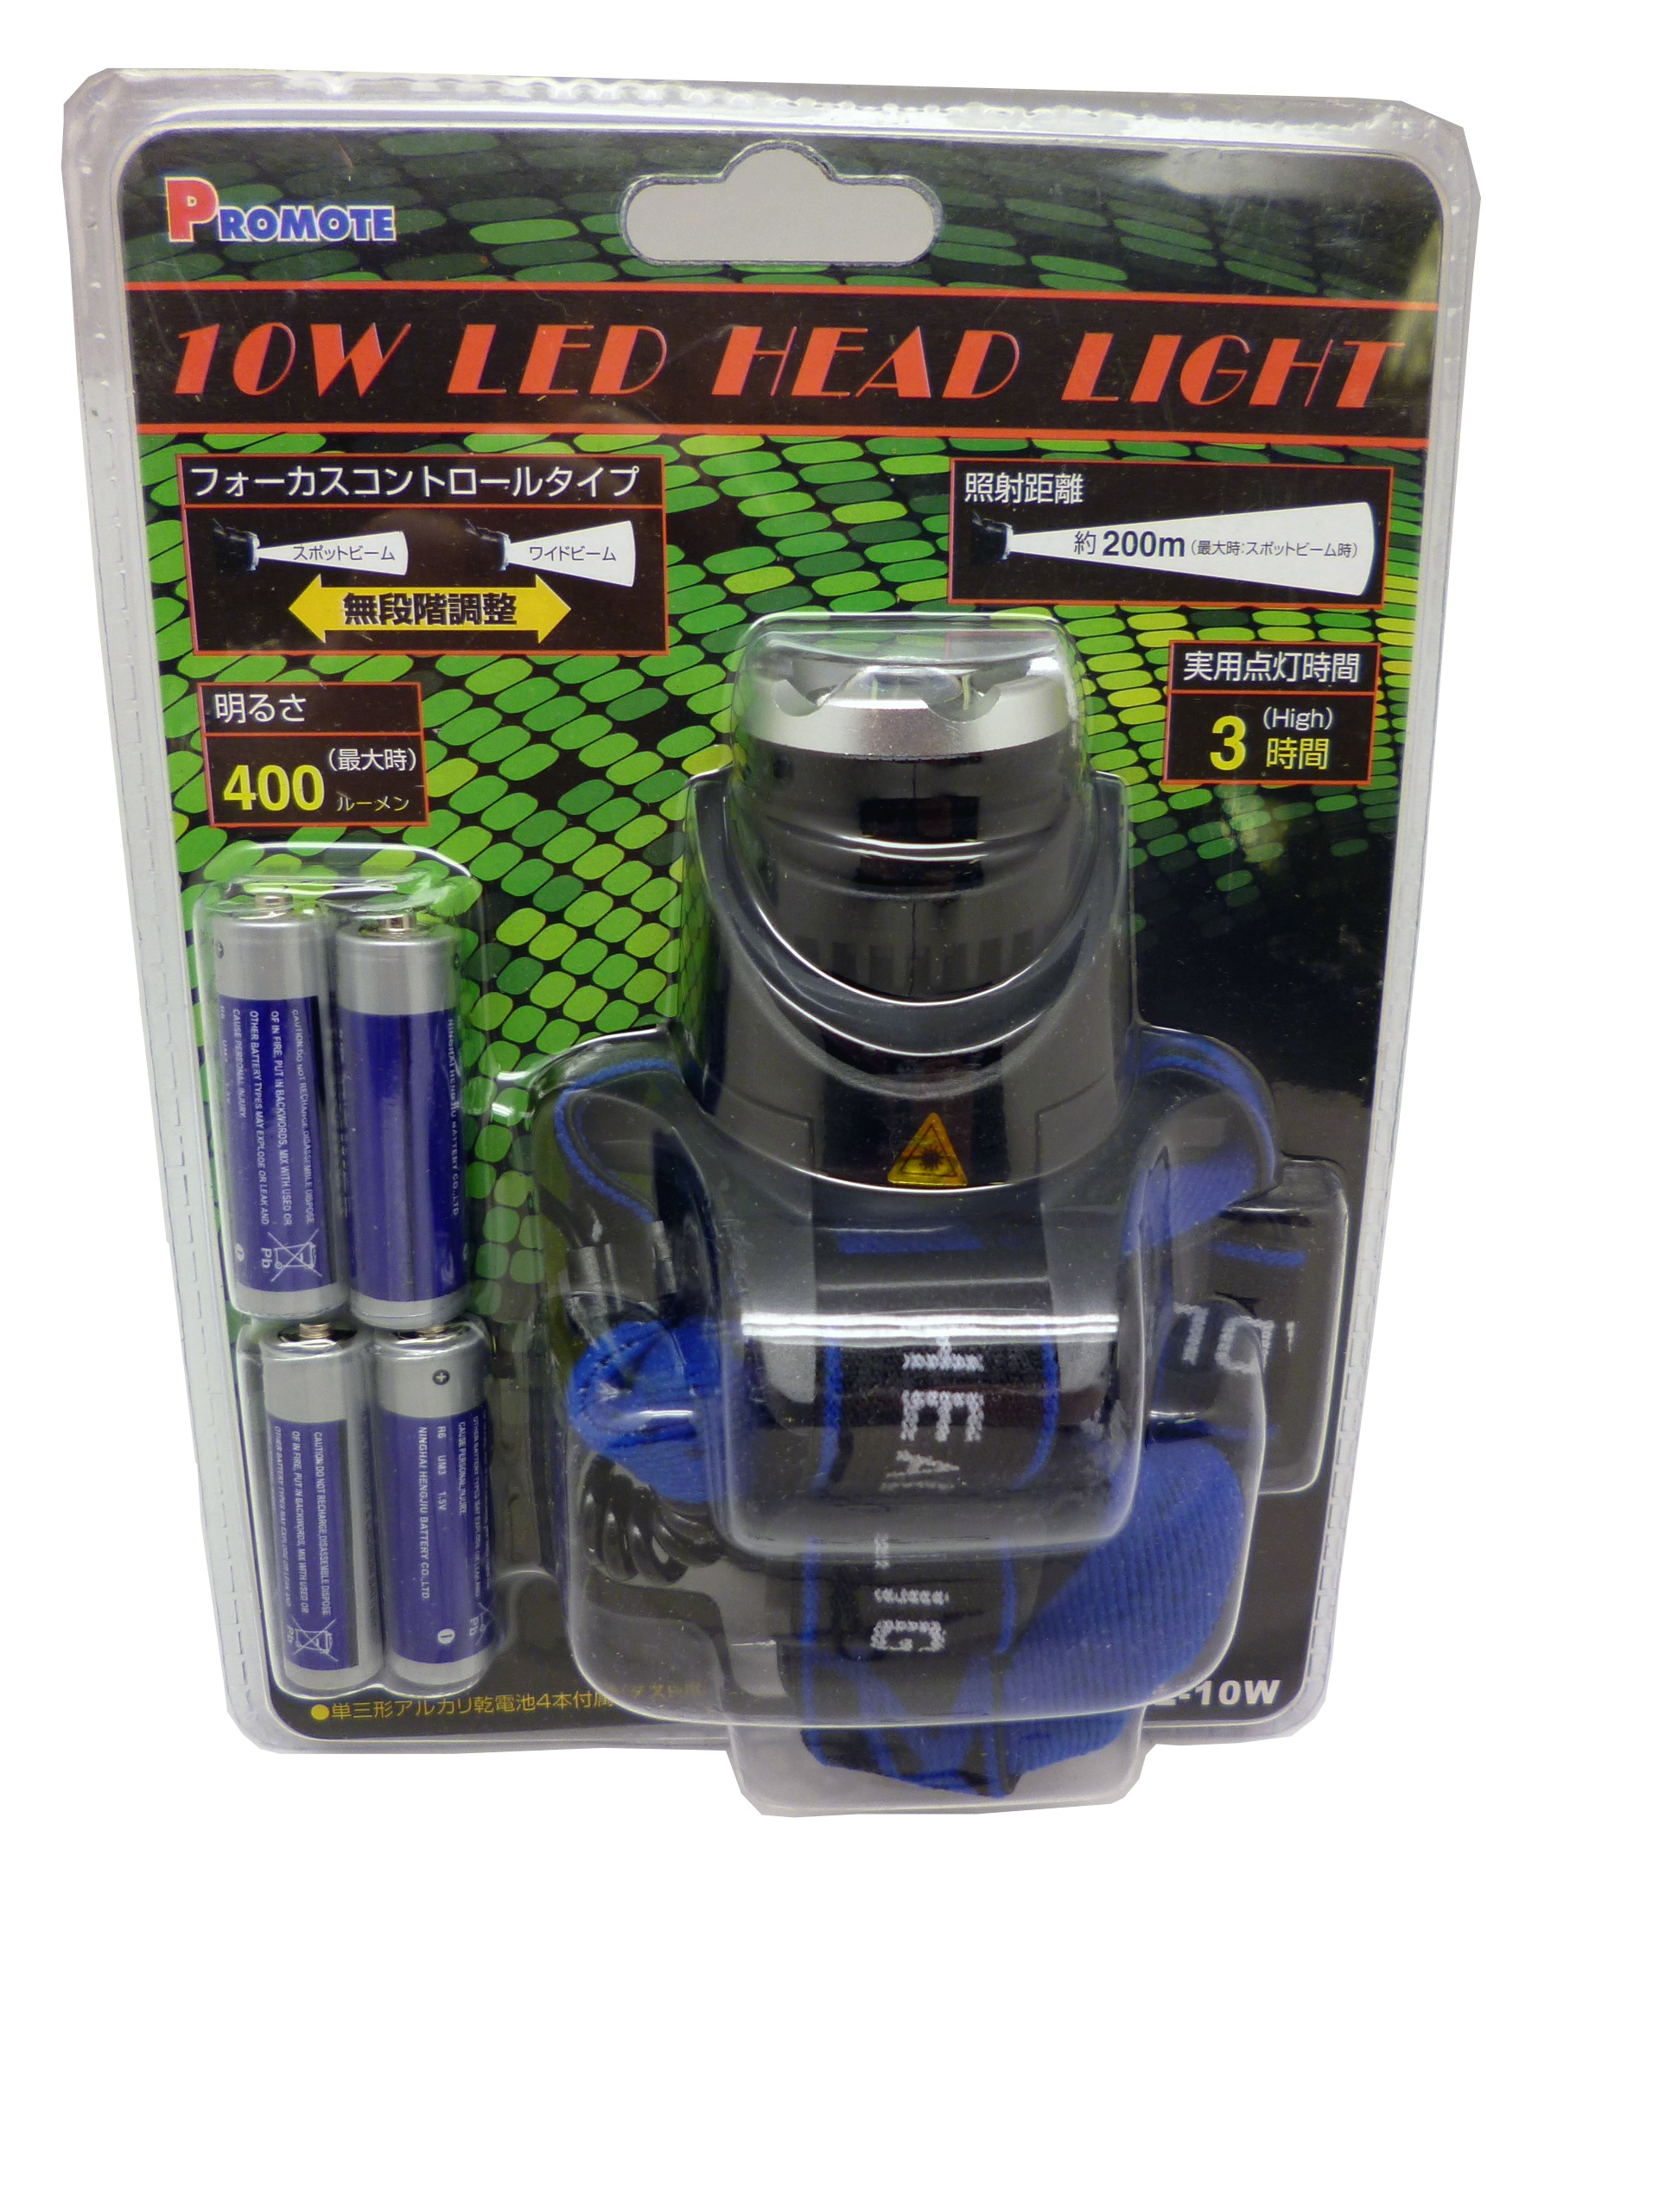 10W LEDヘッドライト